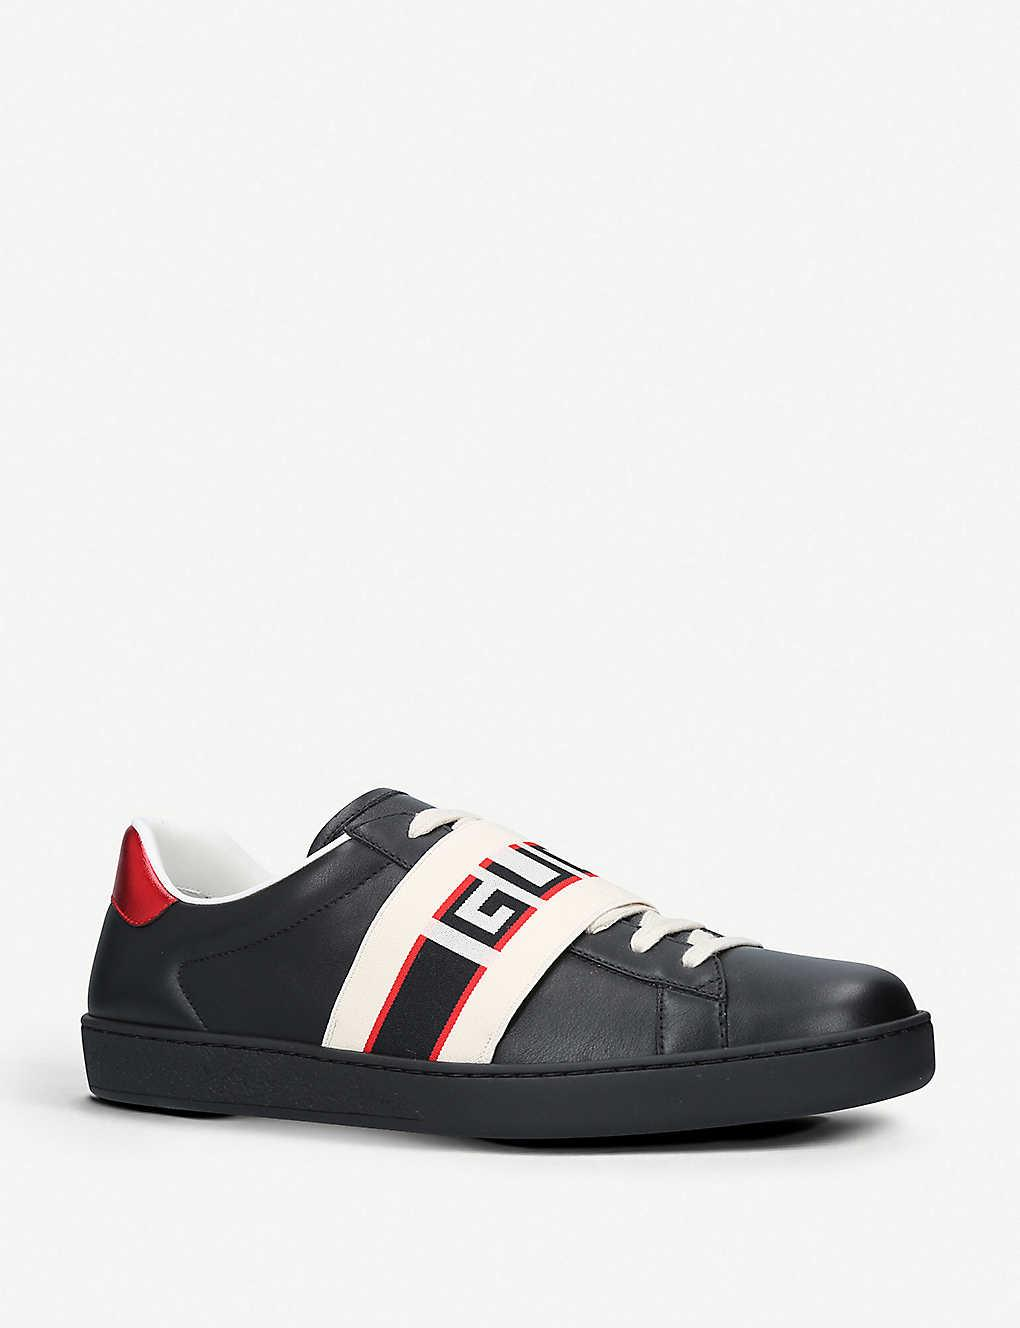 Gucci Rubber New Ace Sneaker in Black